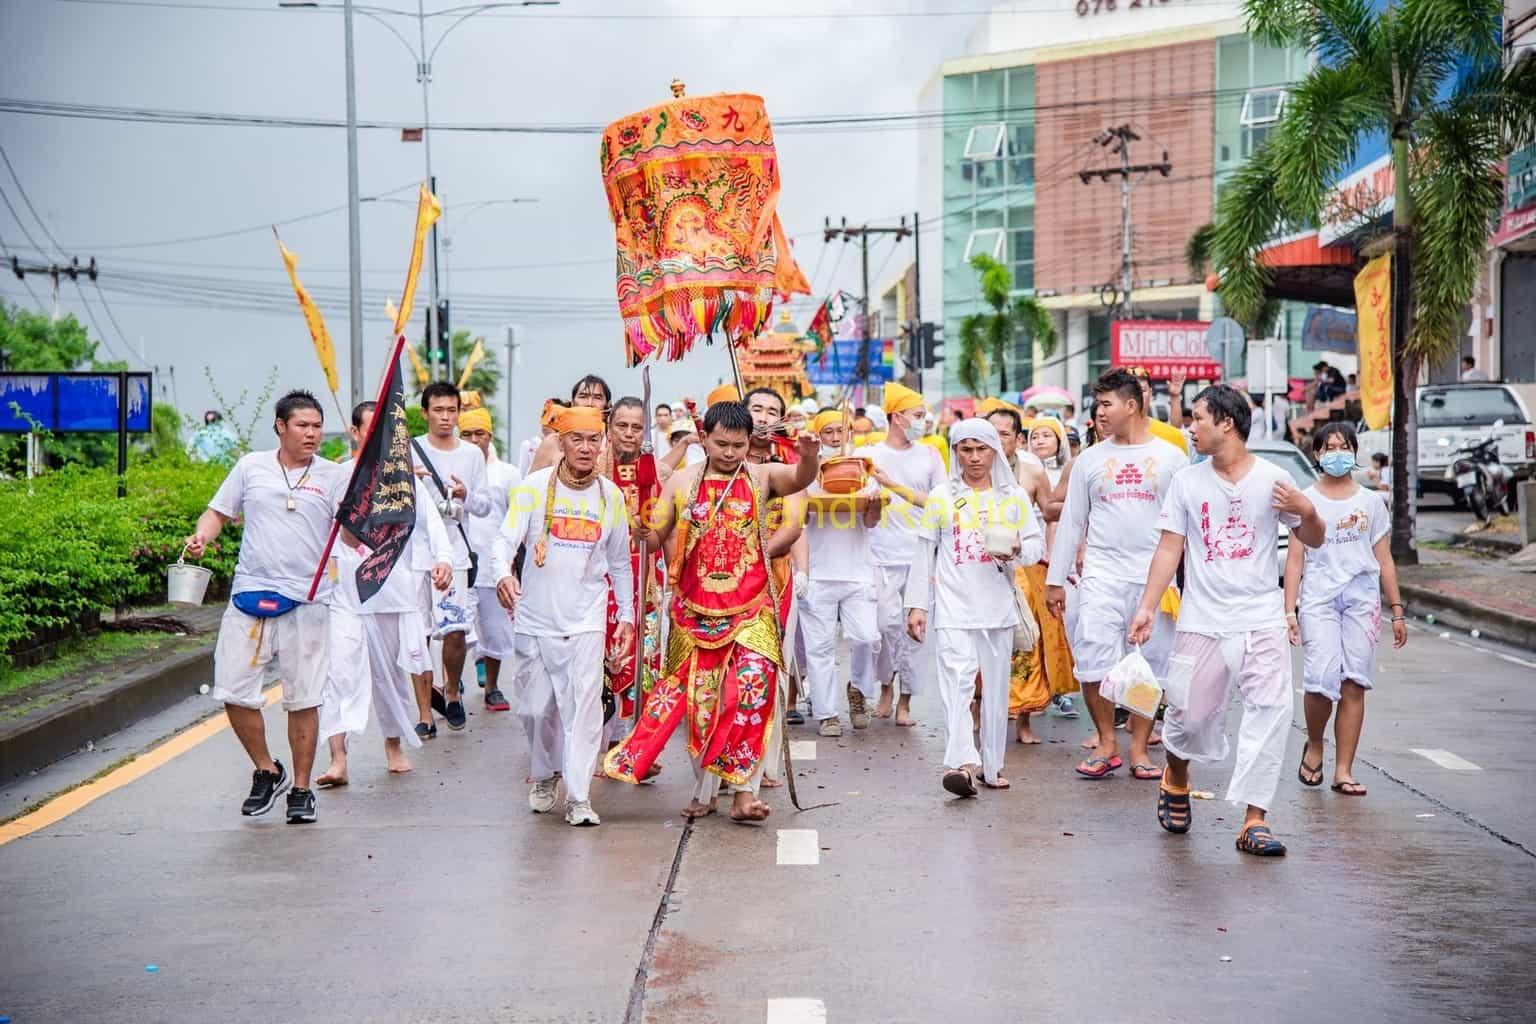 First Parade of the 2016 Phuket Vegetarian Festival